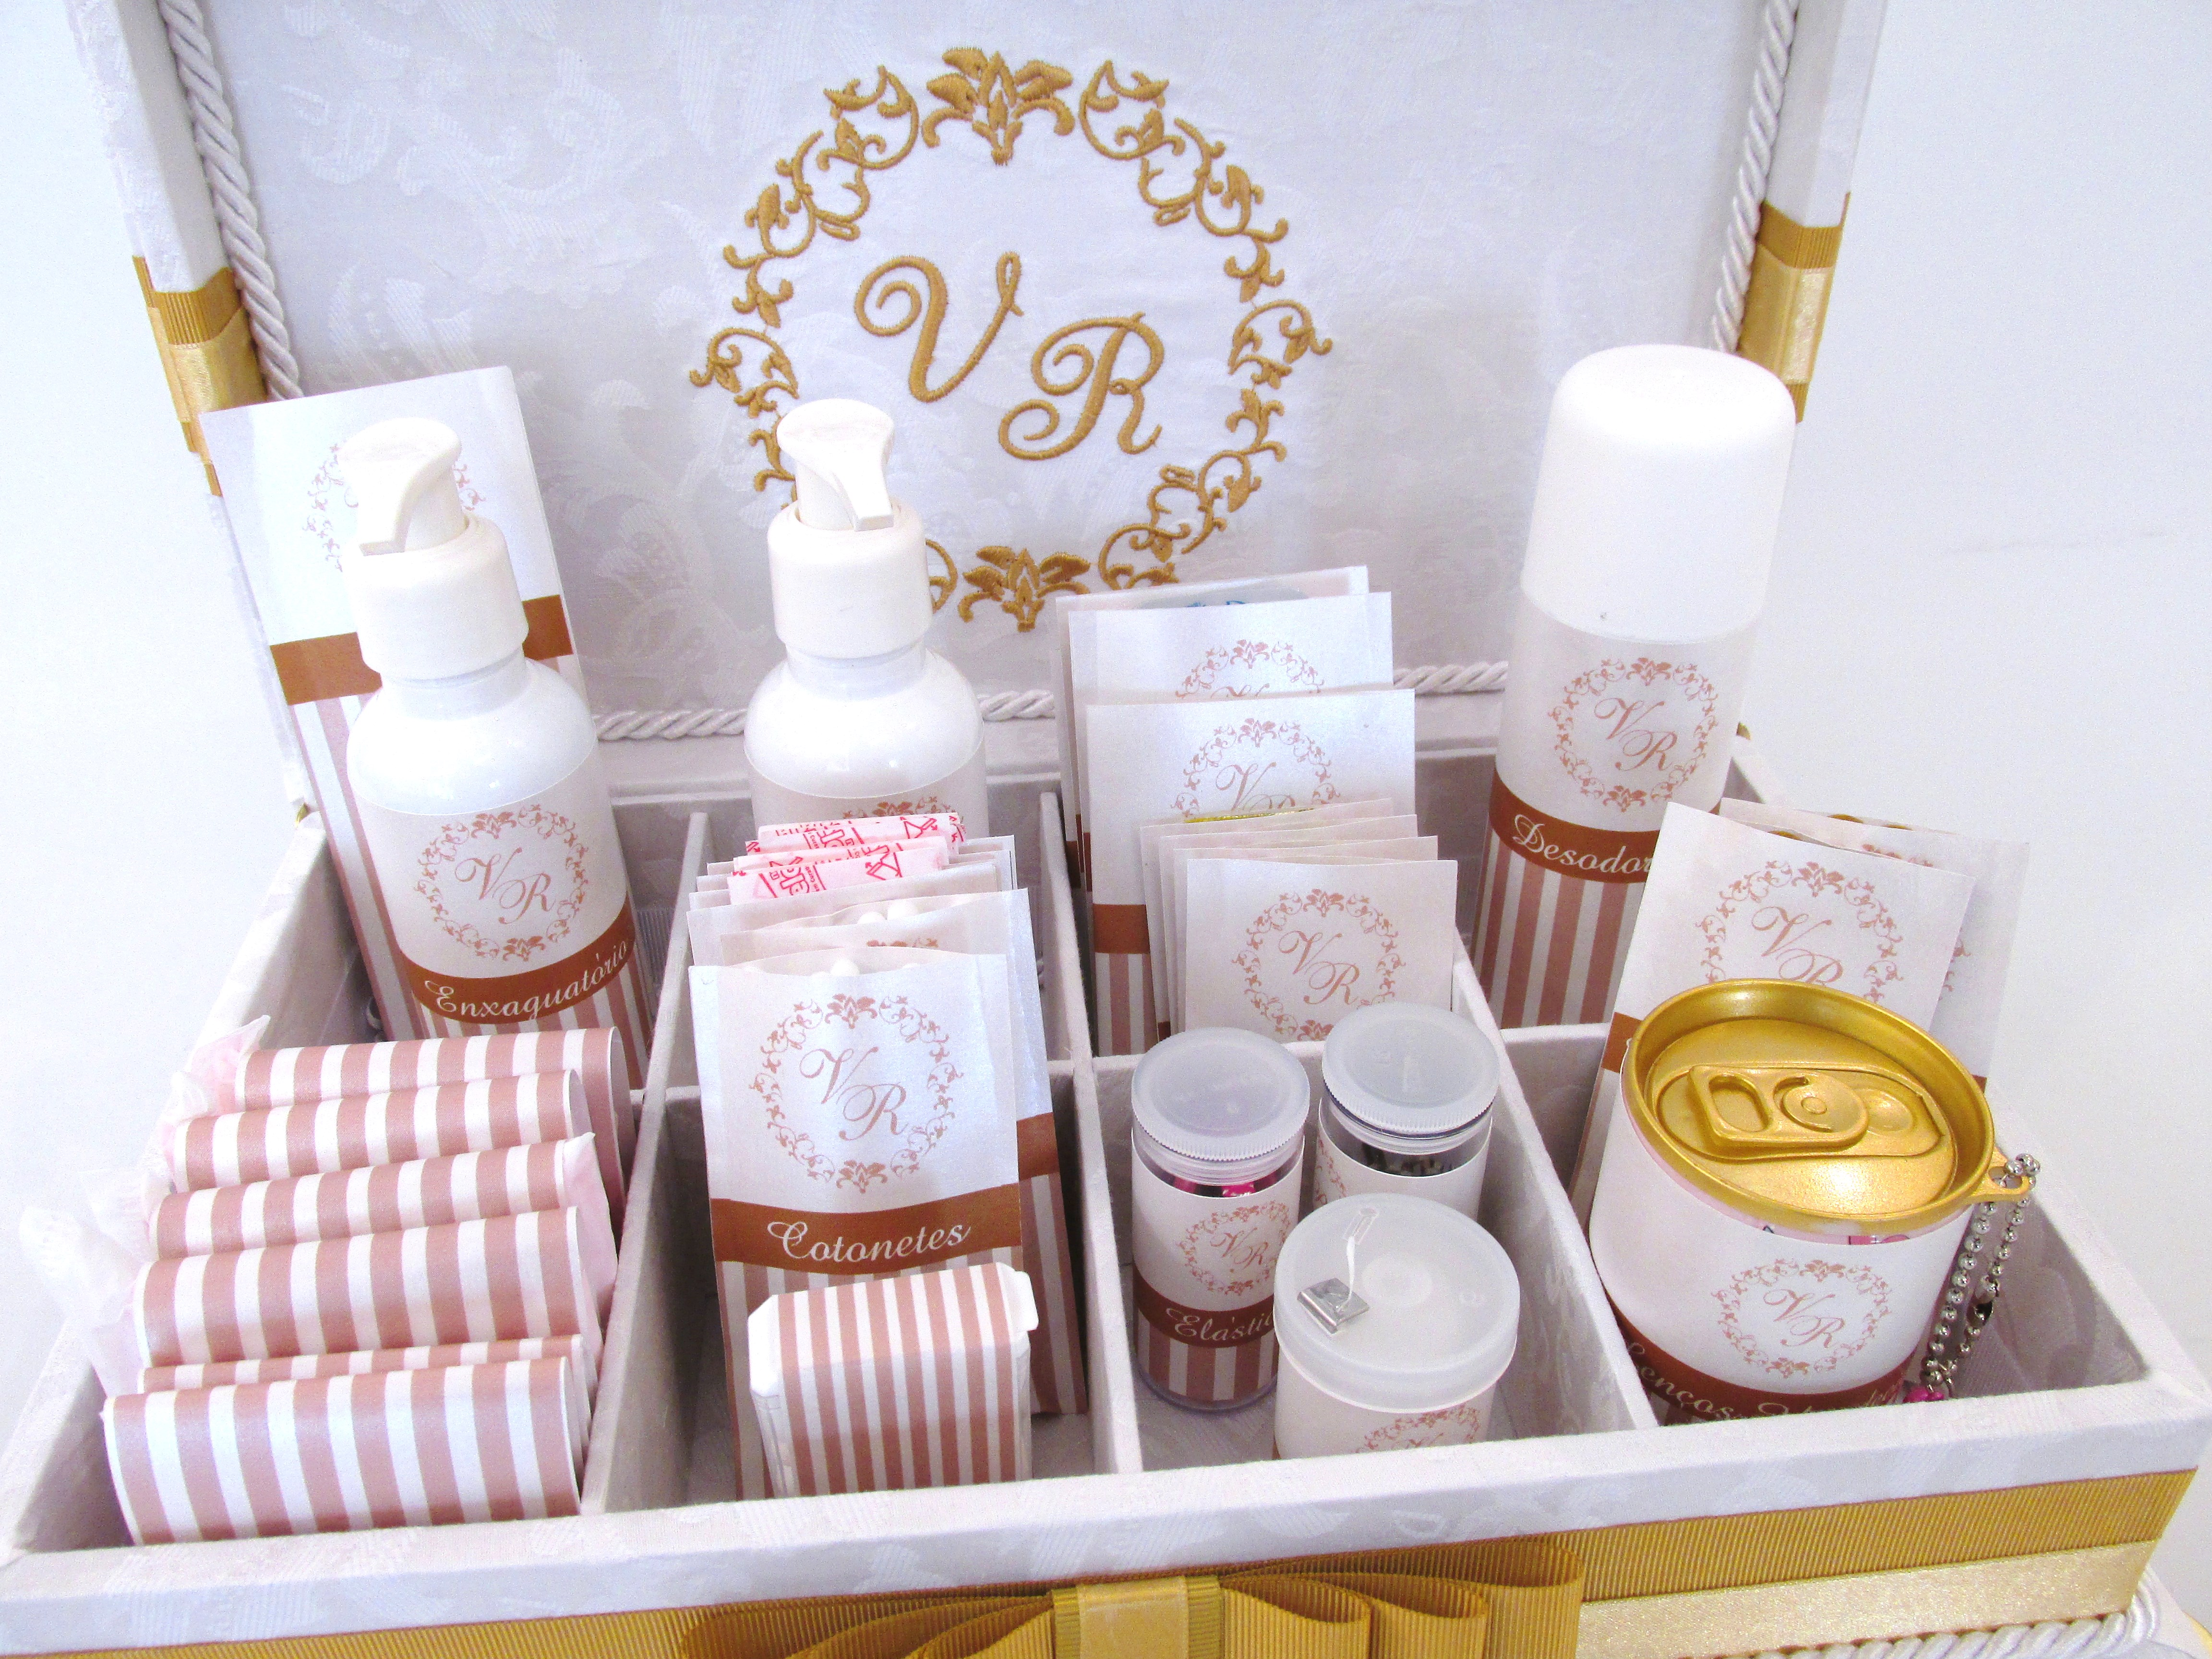 Kit Banheiro Para Casamento Goiania : Milene novaes cerimonial kit toilette fa?a voc? mesma